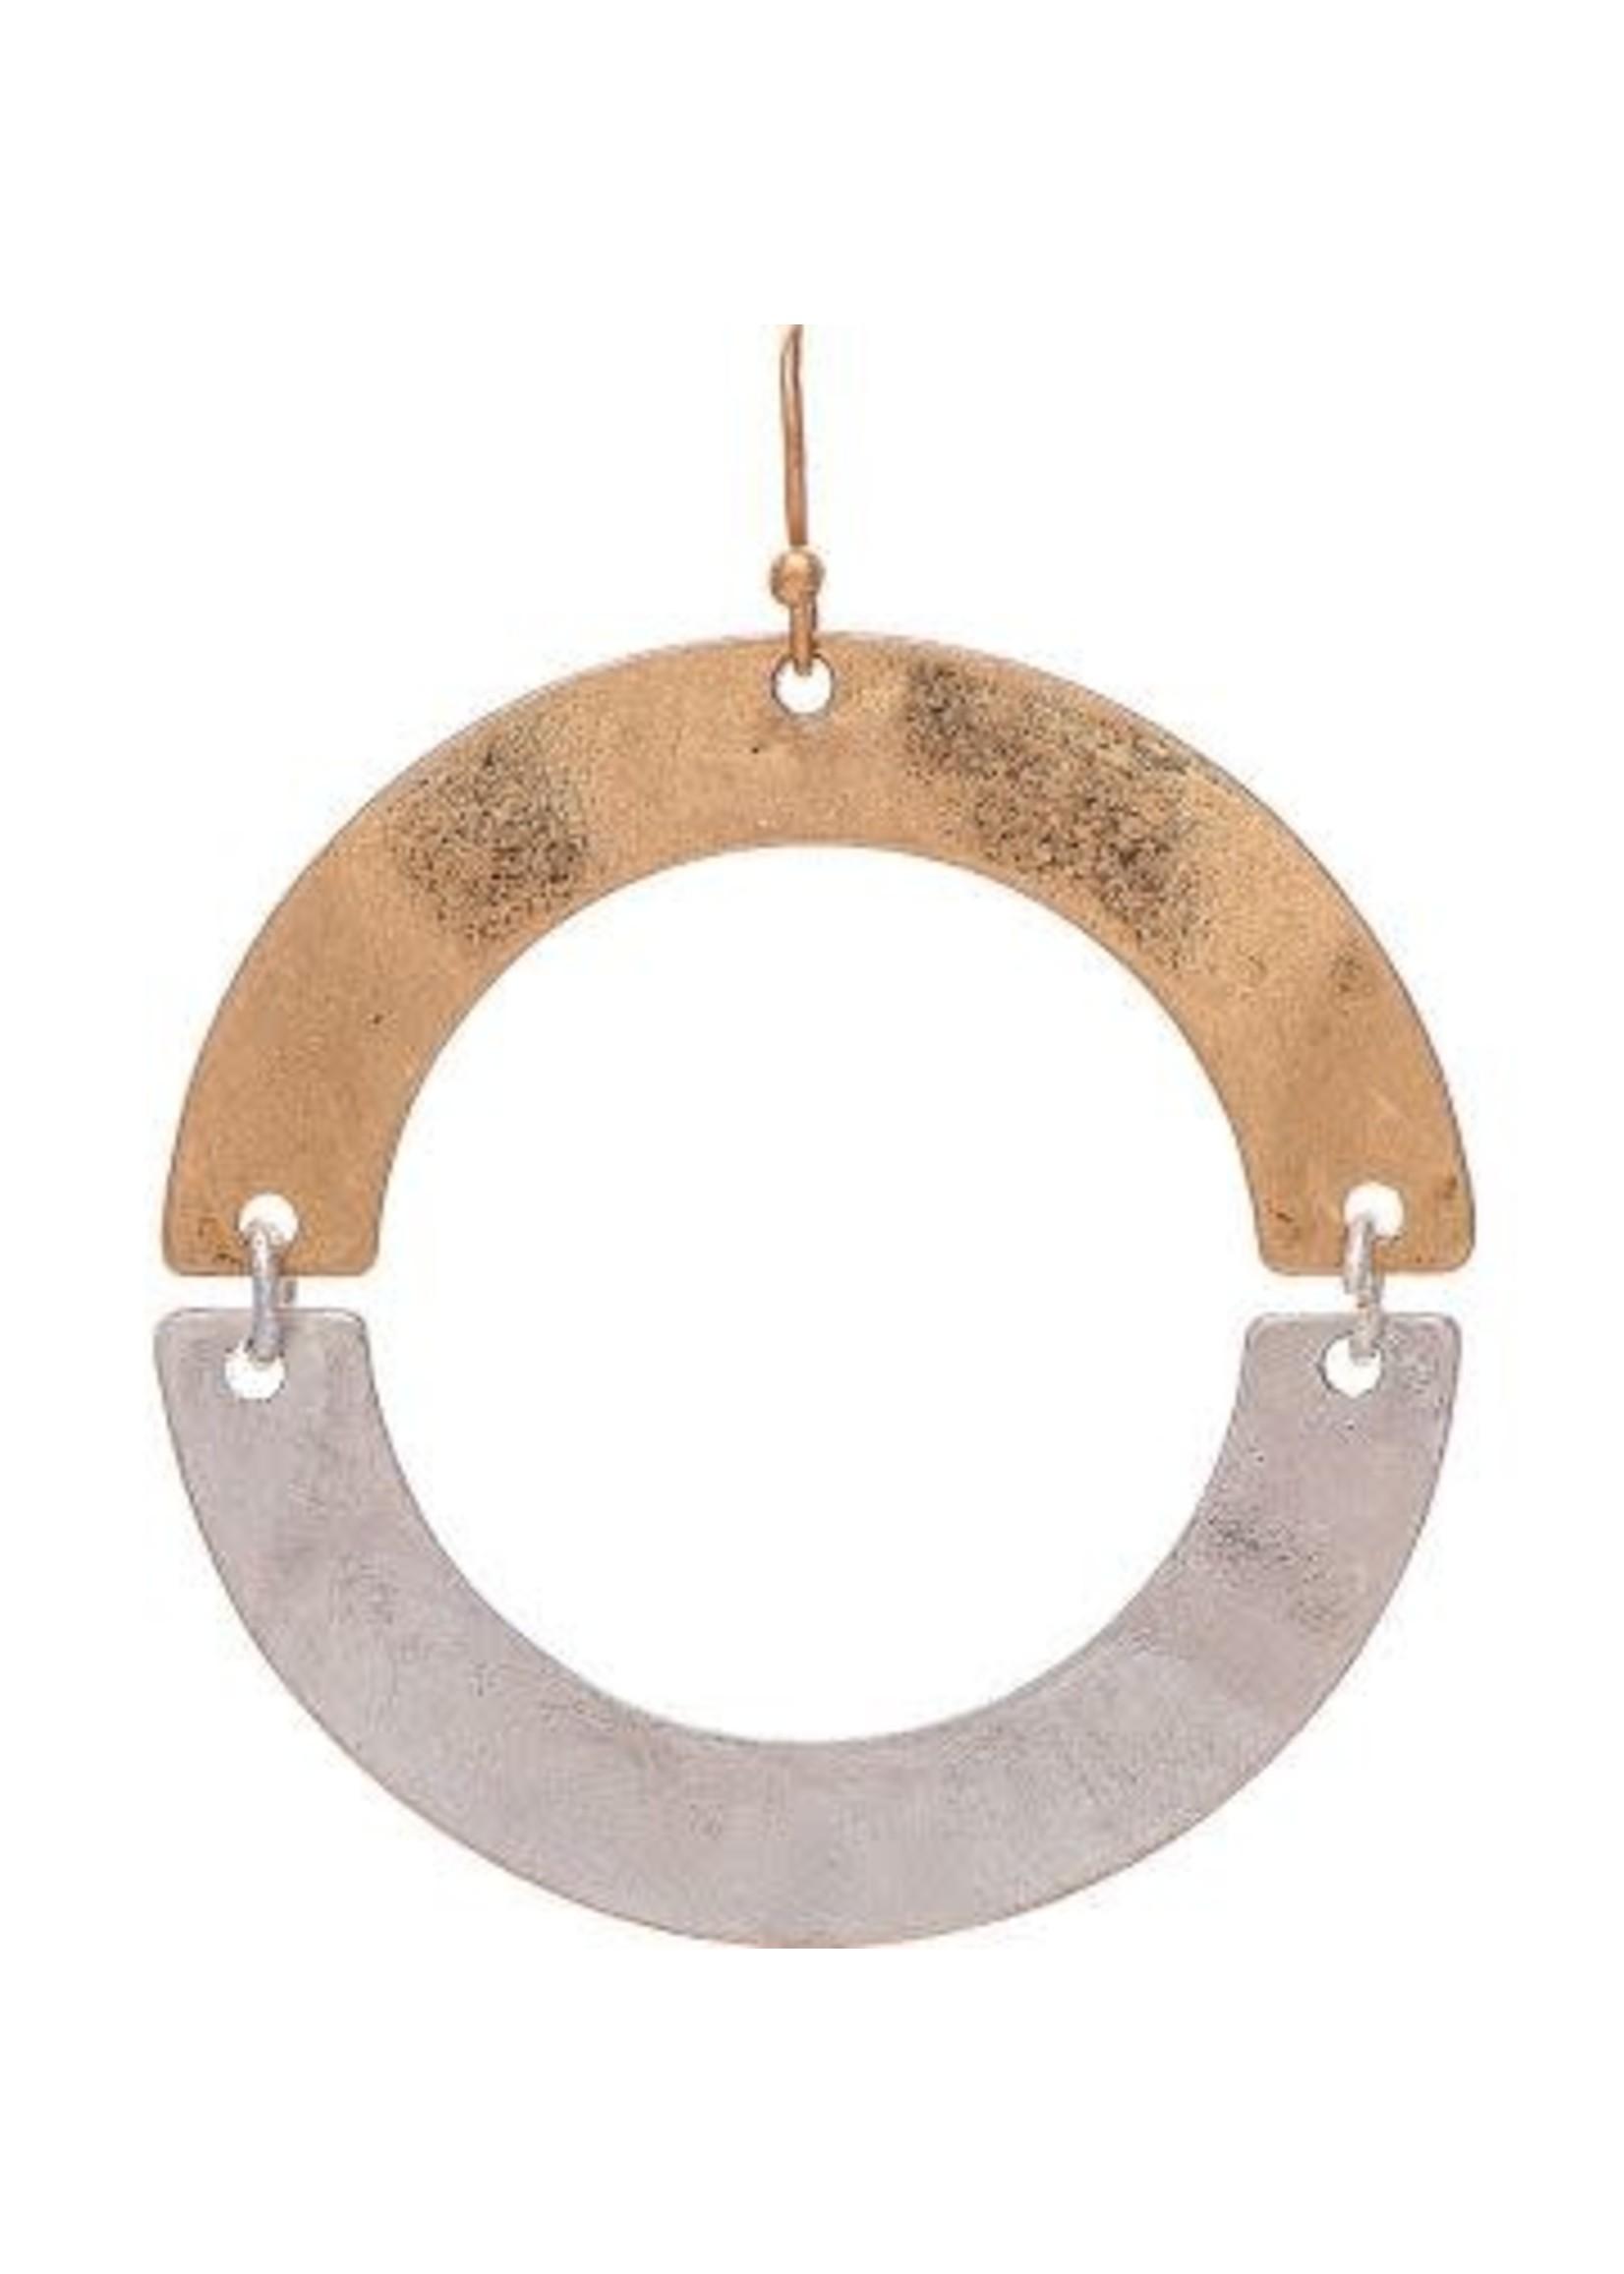 Rain Jewelry Two Tone Hinged Half Circles Earrings